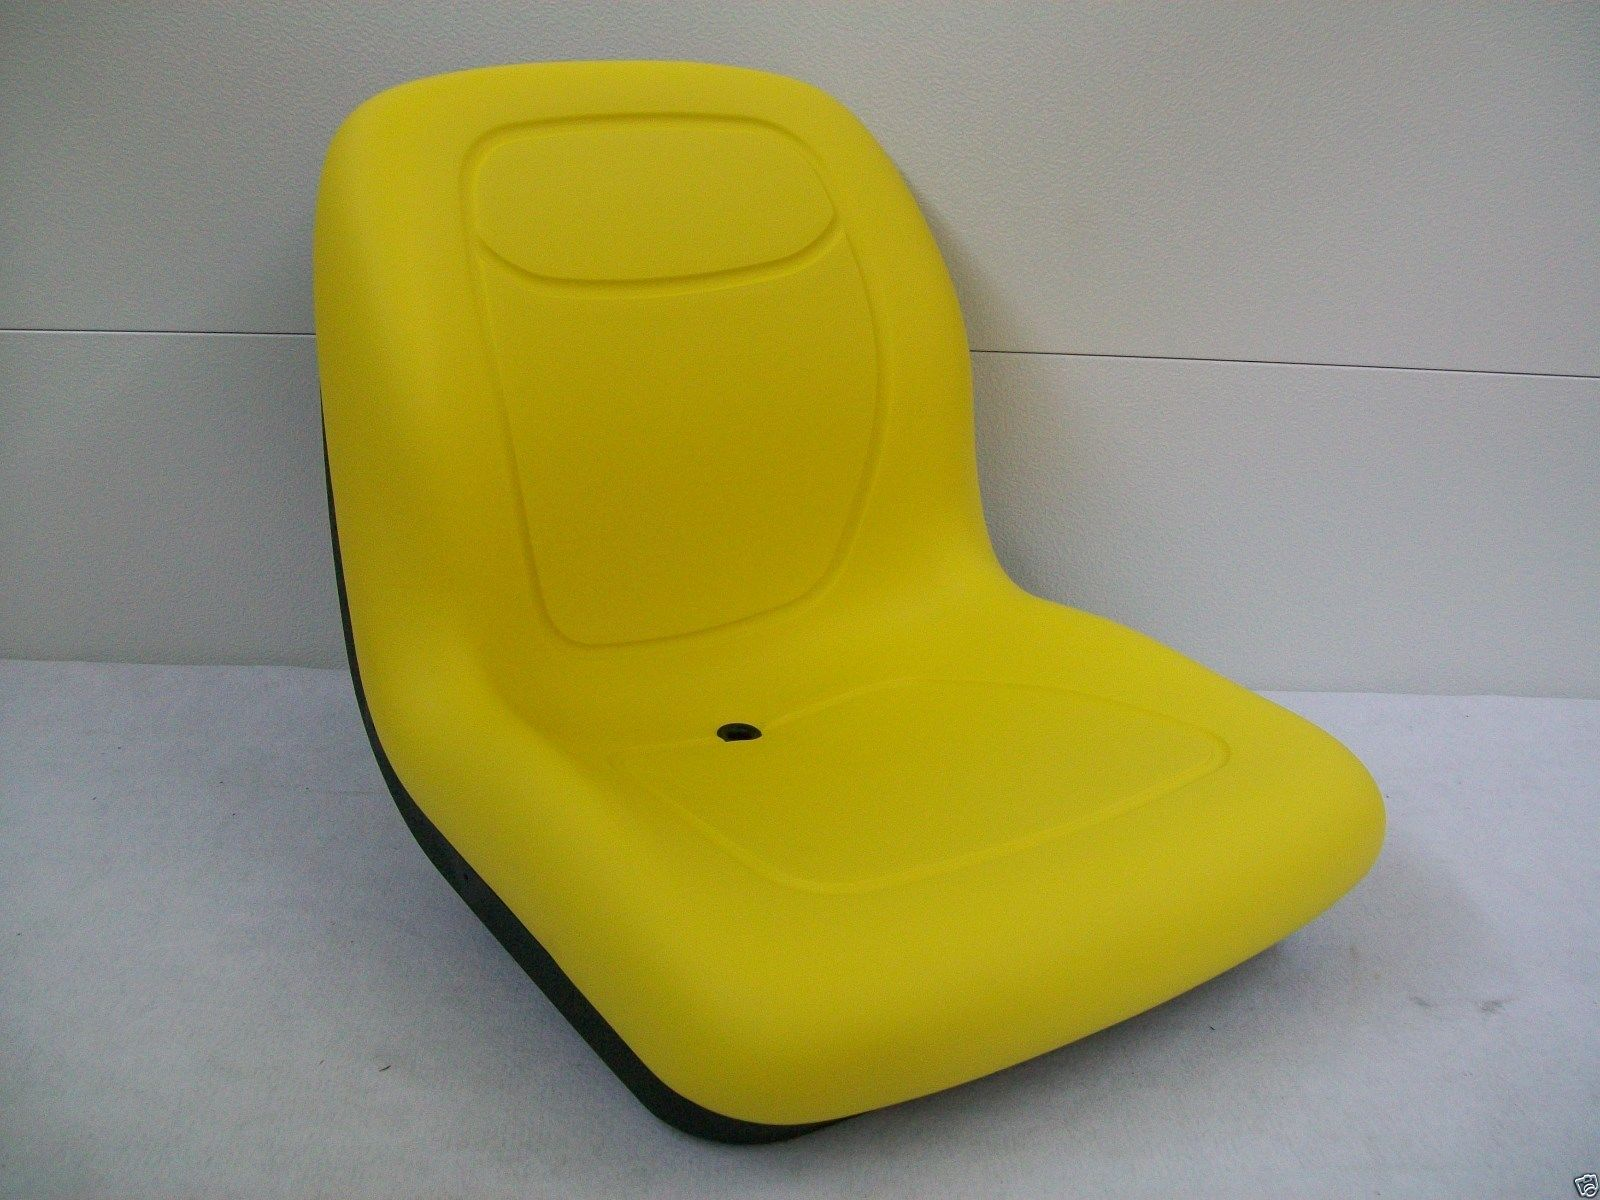 John Deere M653 Parts Diagram Trusted Schematics M665 Wiring Yellow Seat For Zero Turn Mower Z Trak M655 Srx75